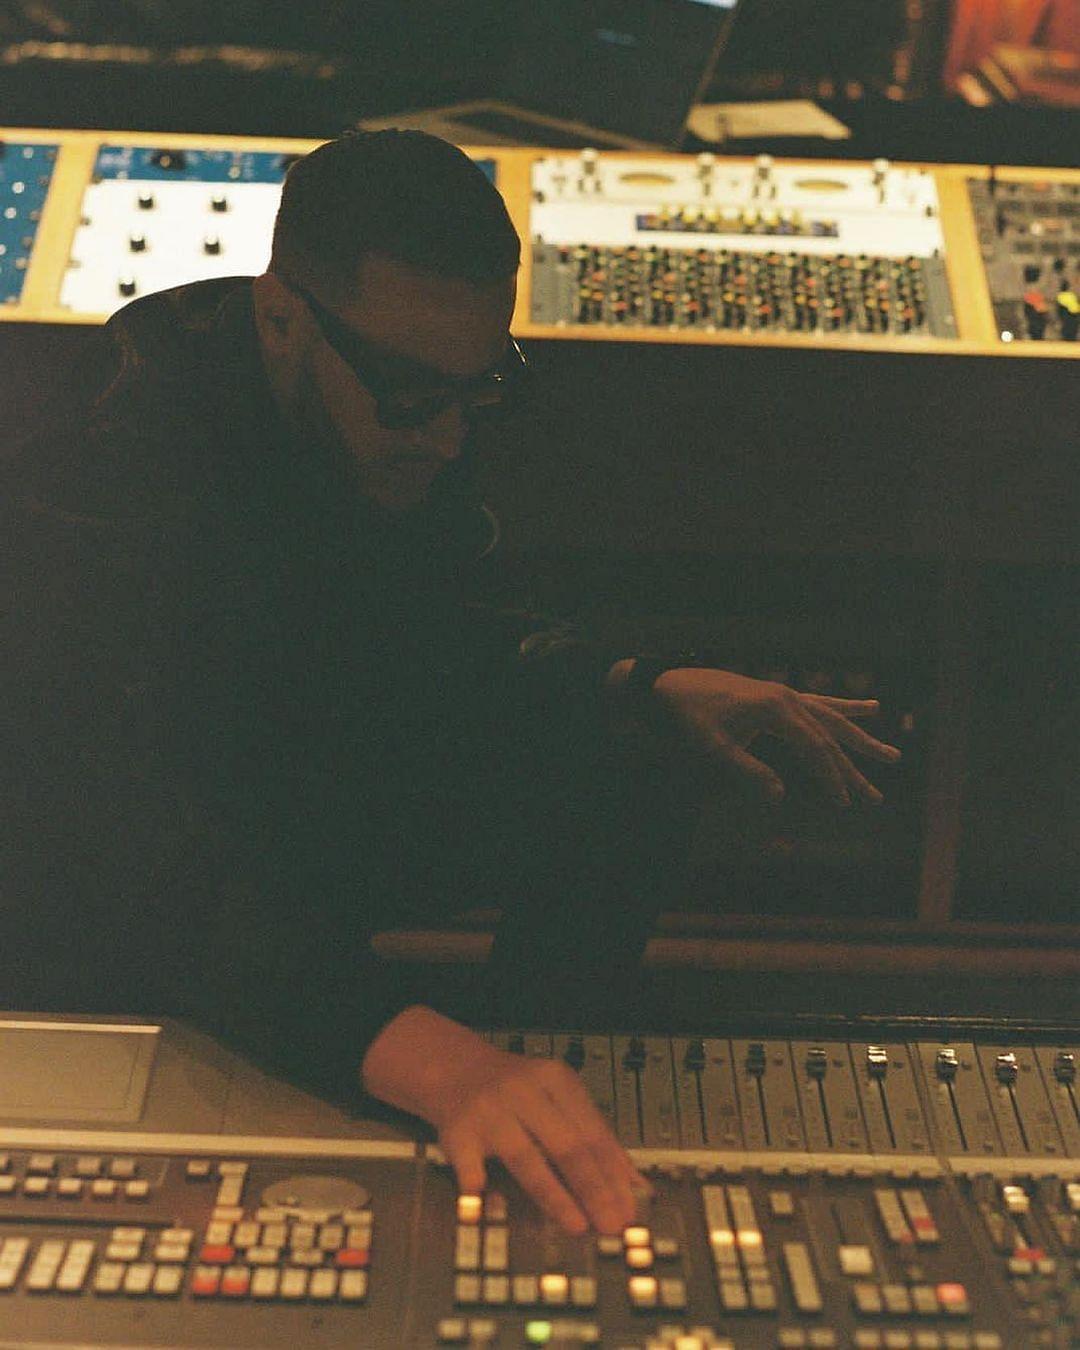 "<div class=""paragraphs""><p>DJ Snake at work, making music.</p></div>"